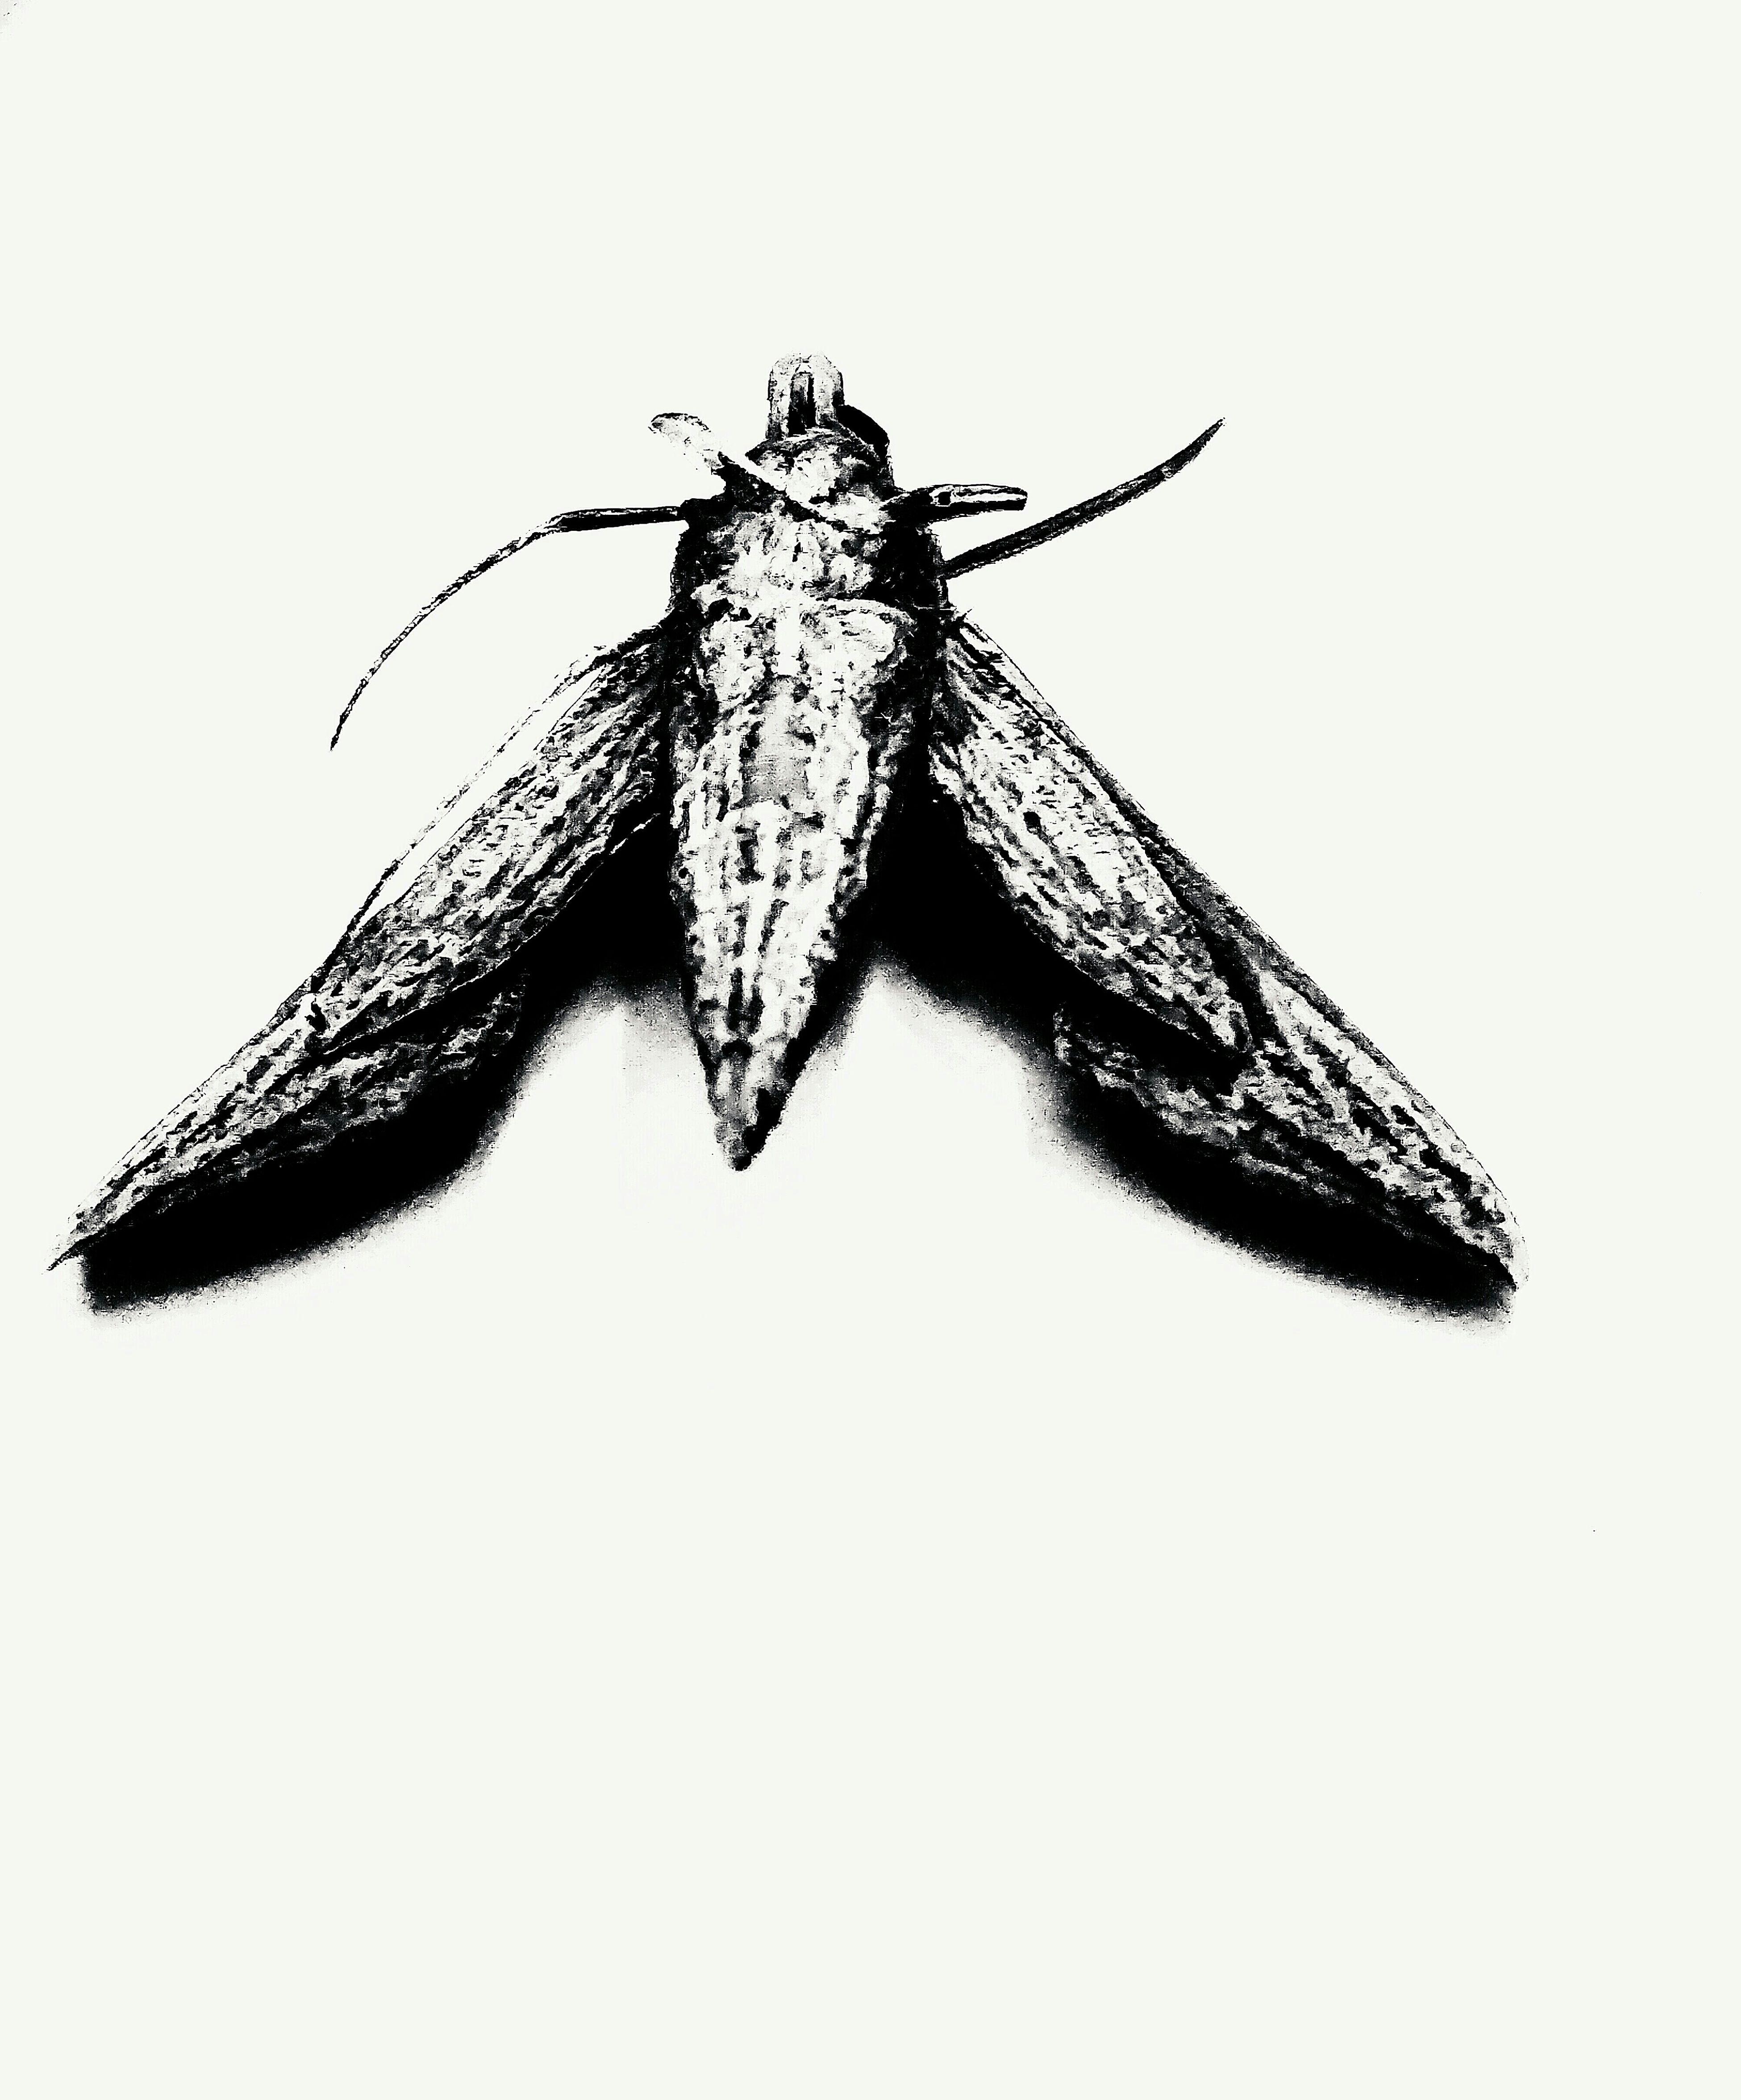 Insect Moth Blackandwhite Likeaninkdrawing Reverse Reversaloffortune